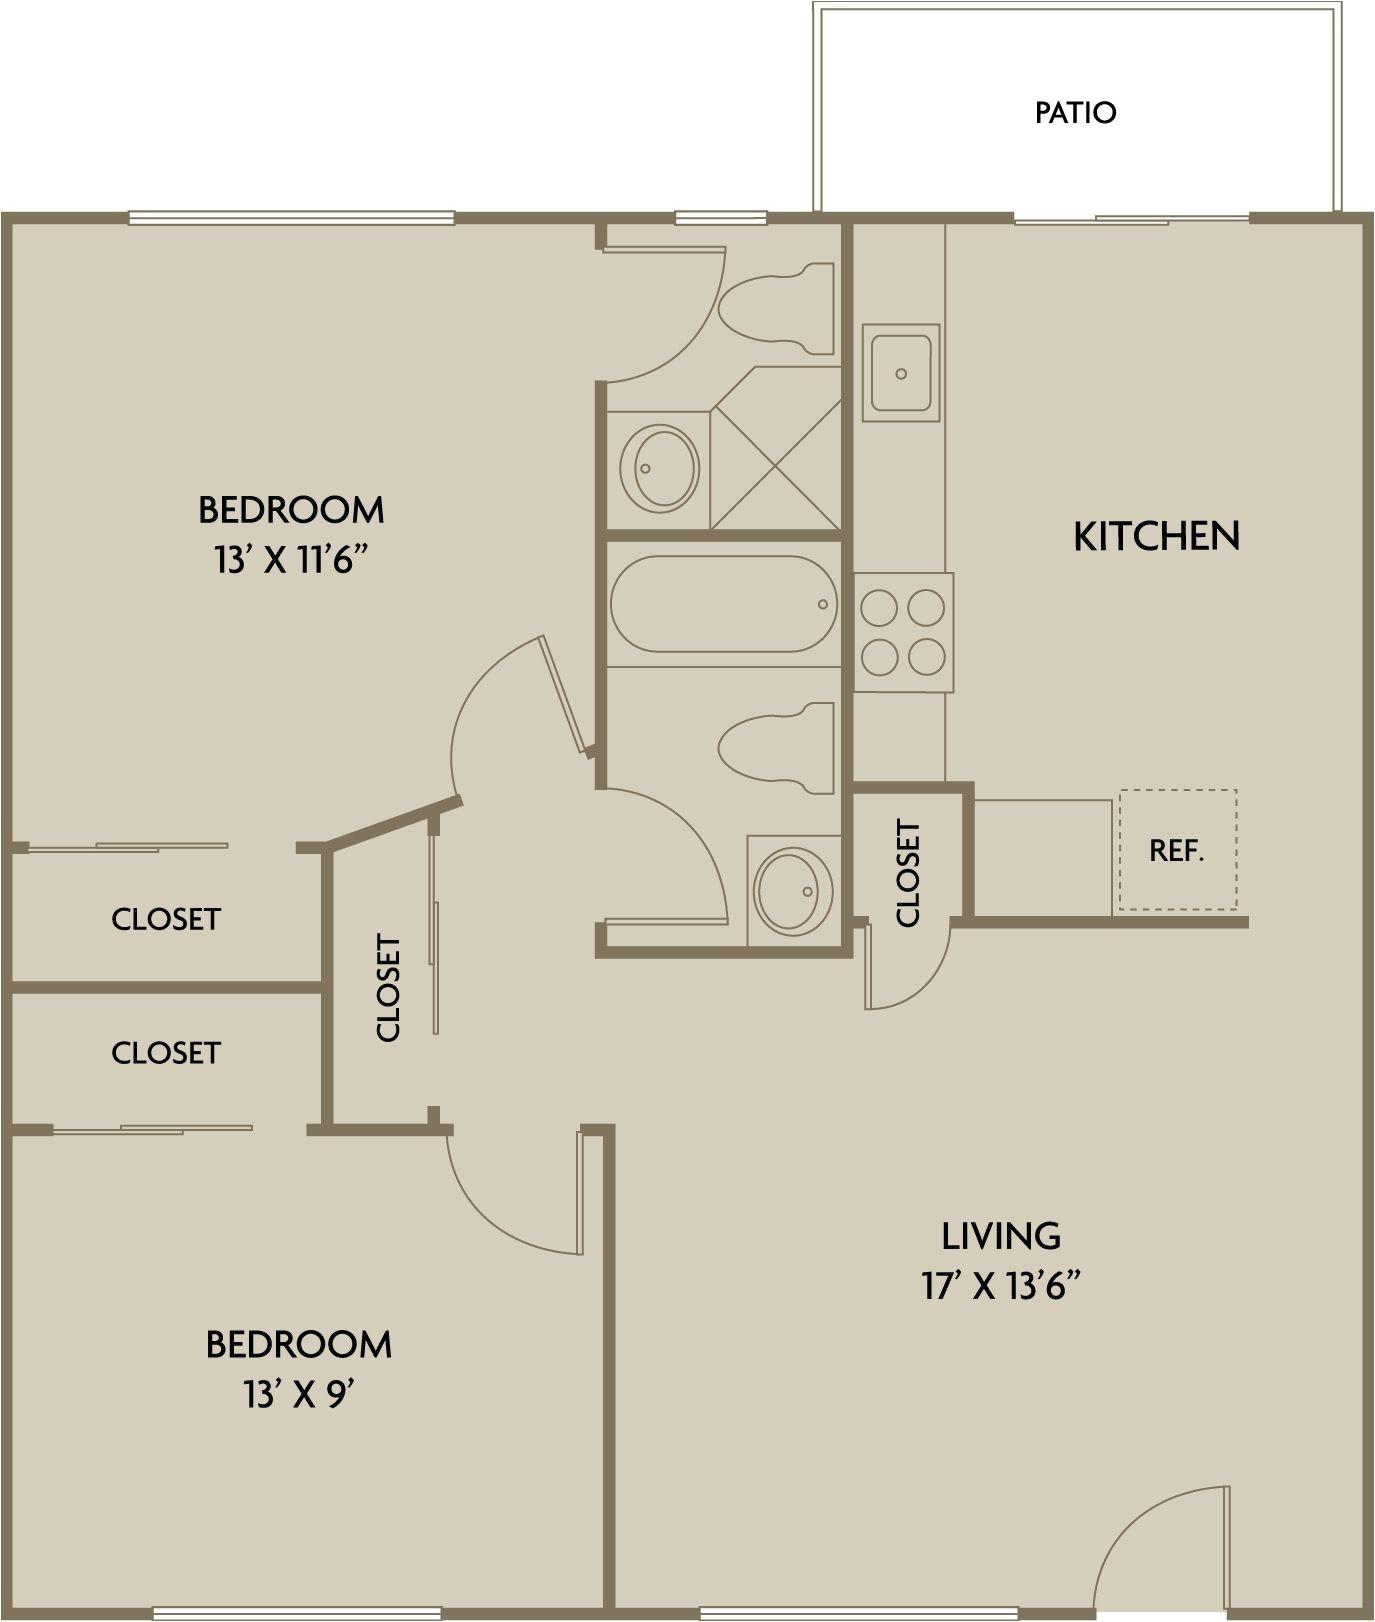 2 bedroom 2 1 2 bath house plans